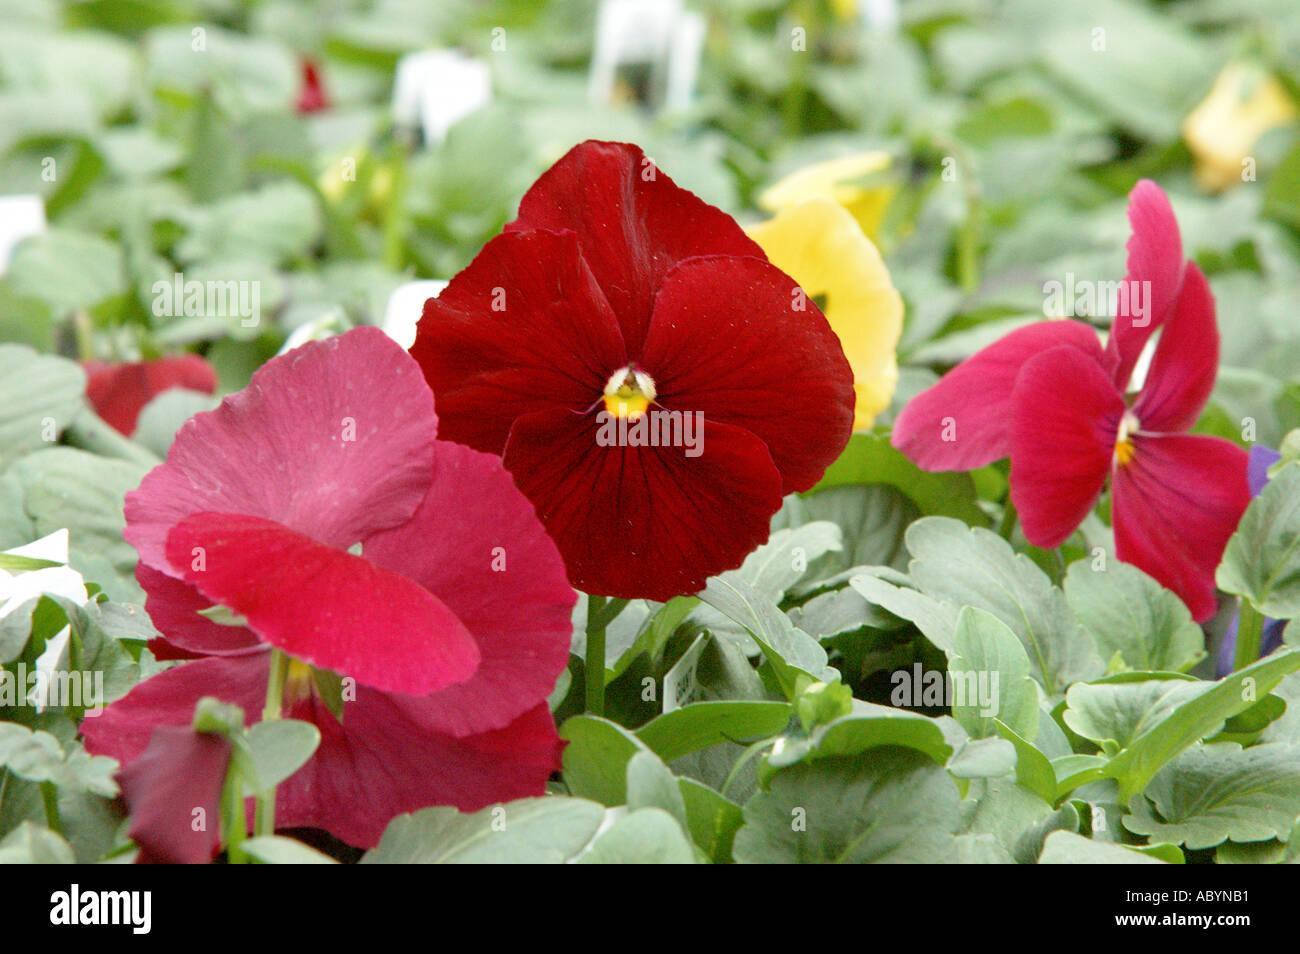 Pansies pansy flower flowers floural greenhouse garden flower plant ...